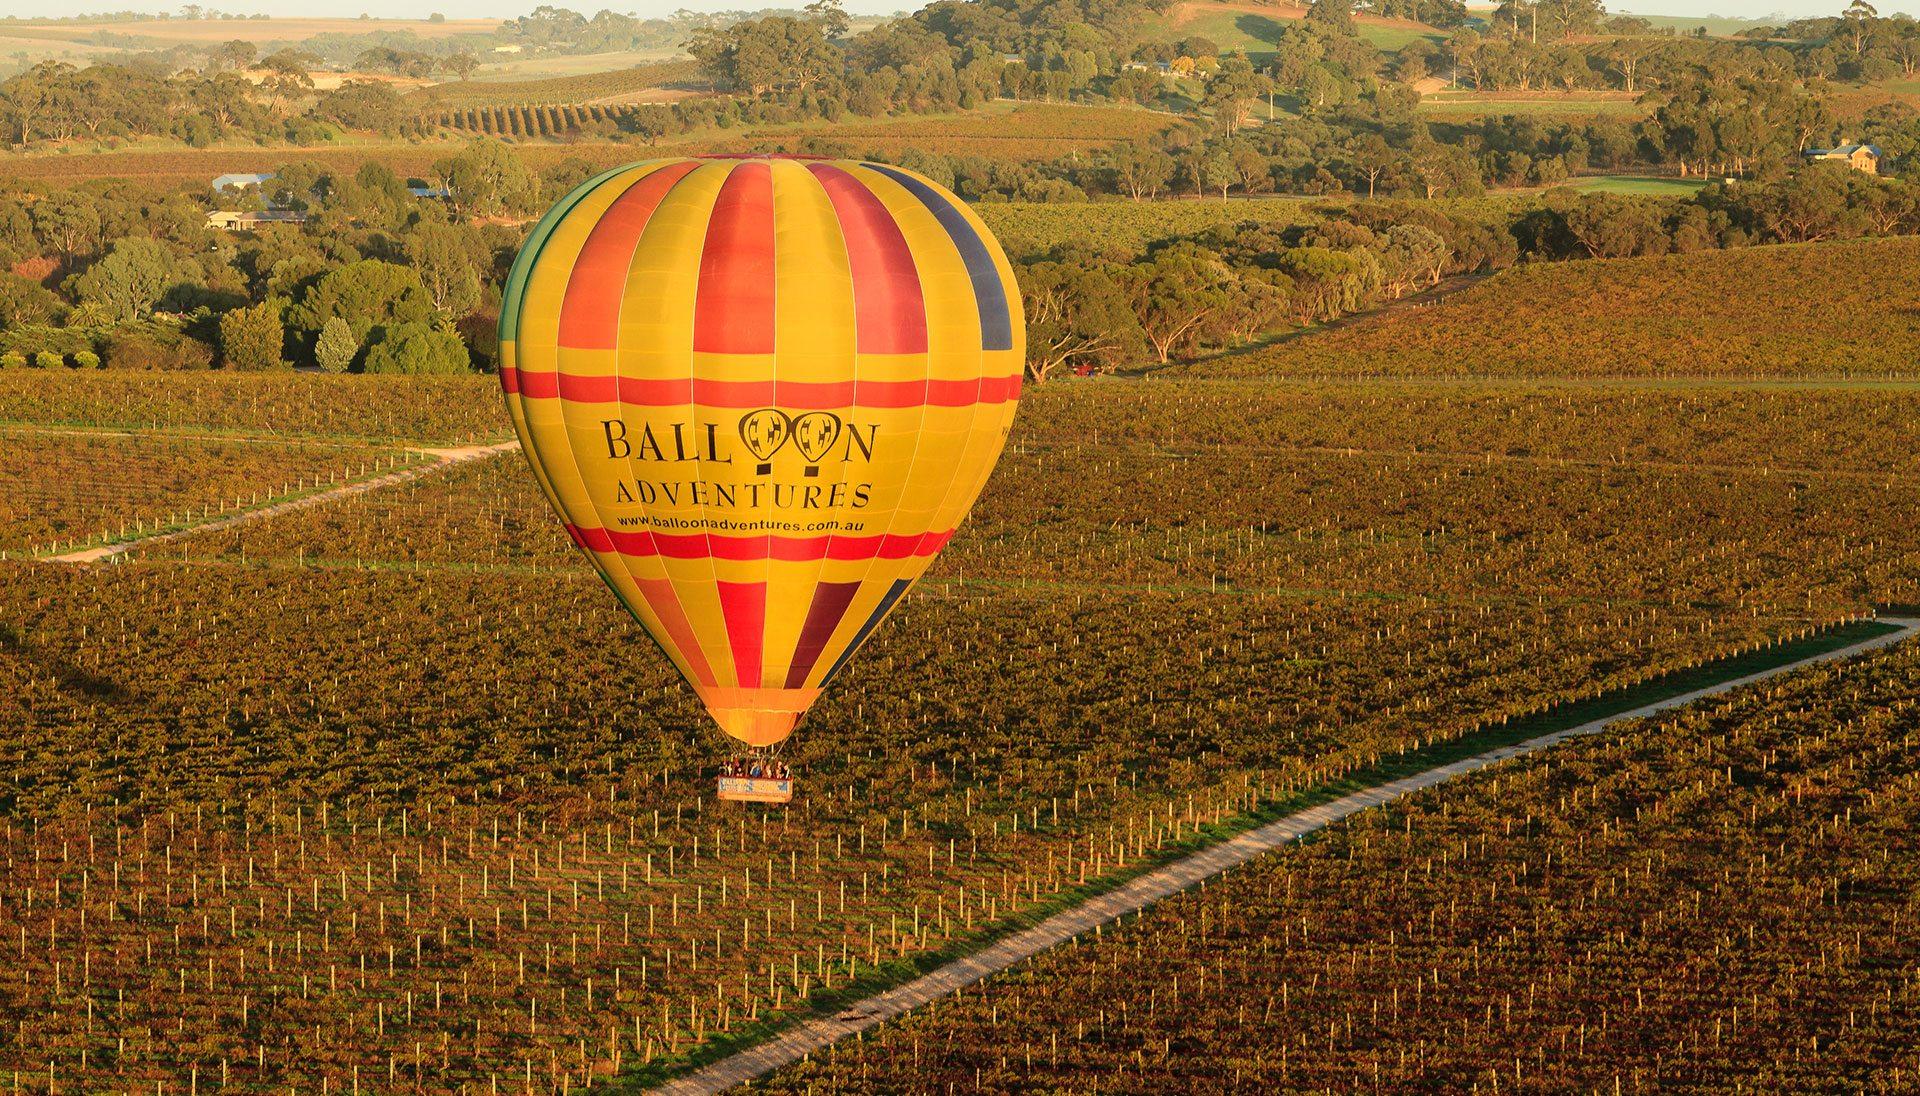 balloon adventures barossa valley hot air balloon adventures bg 18